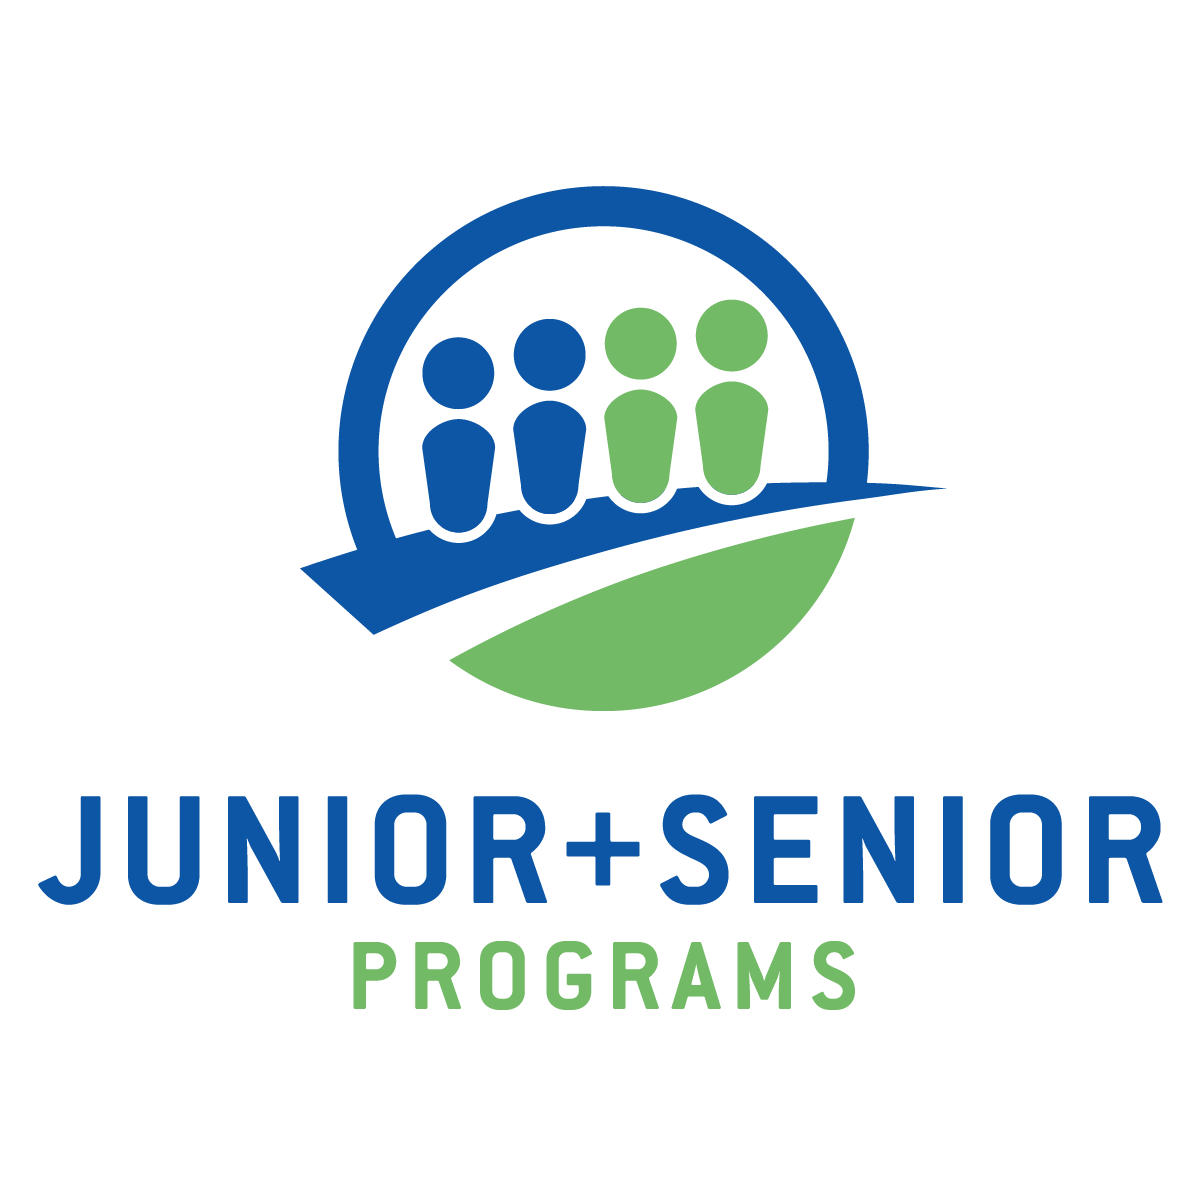 Junior+Senior Programs